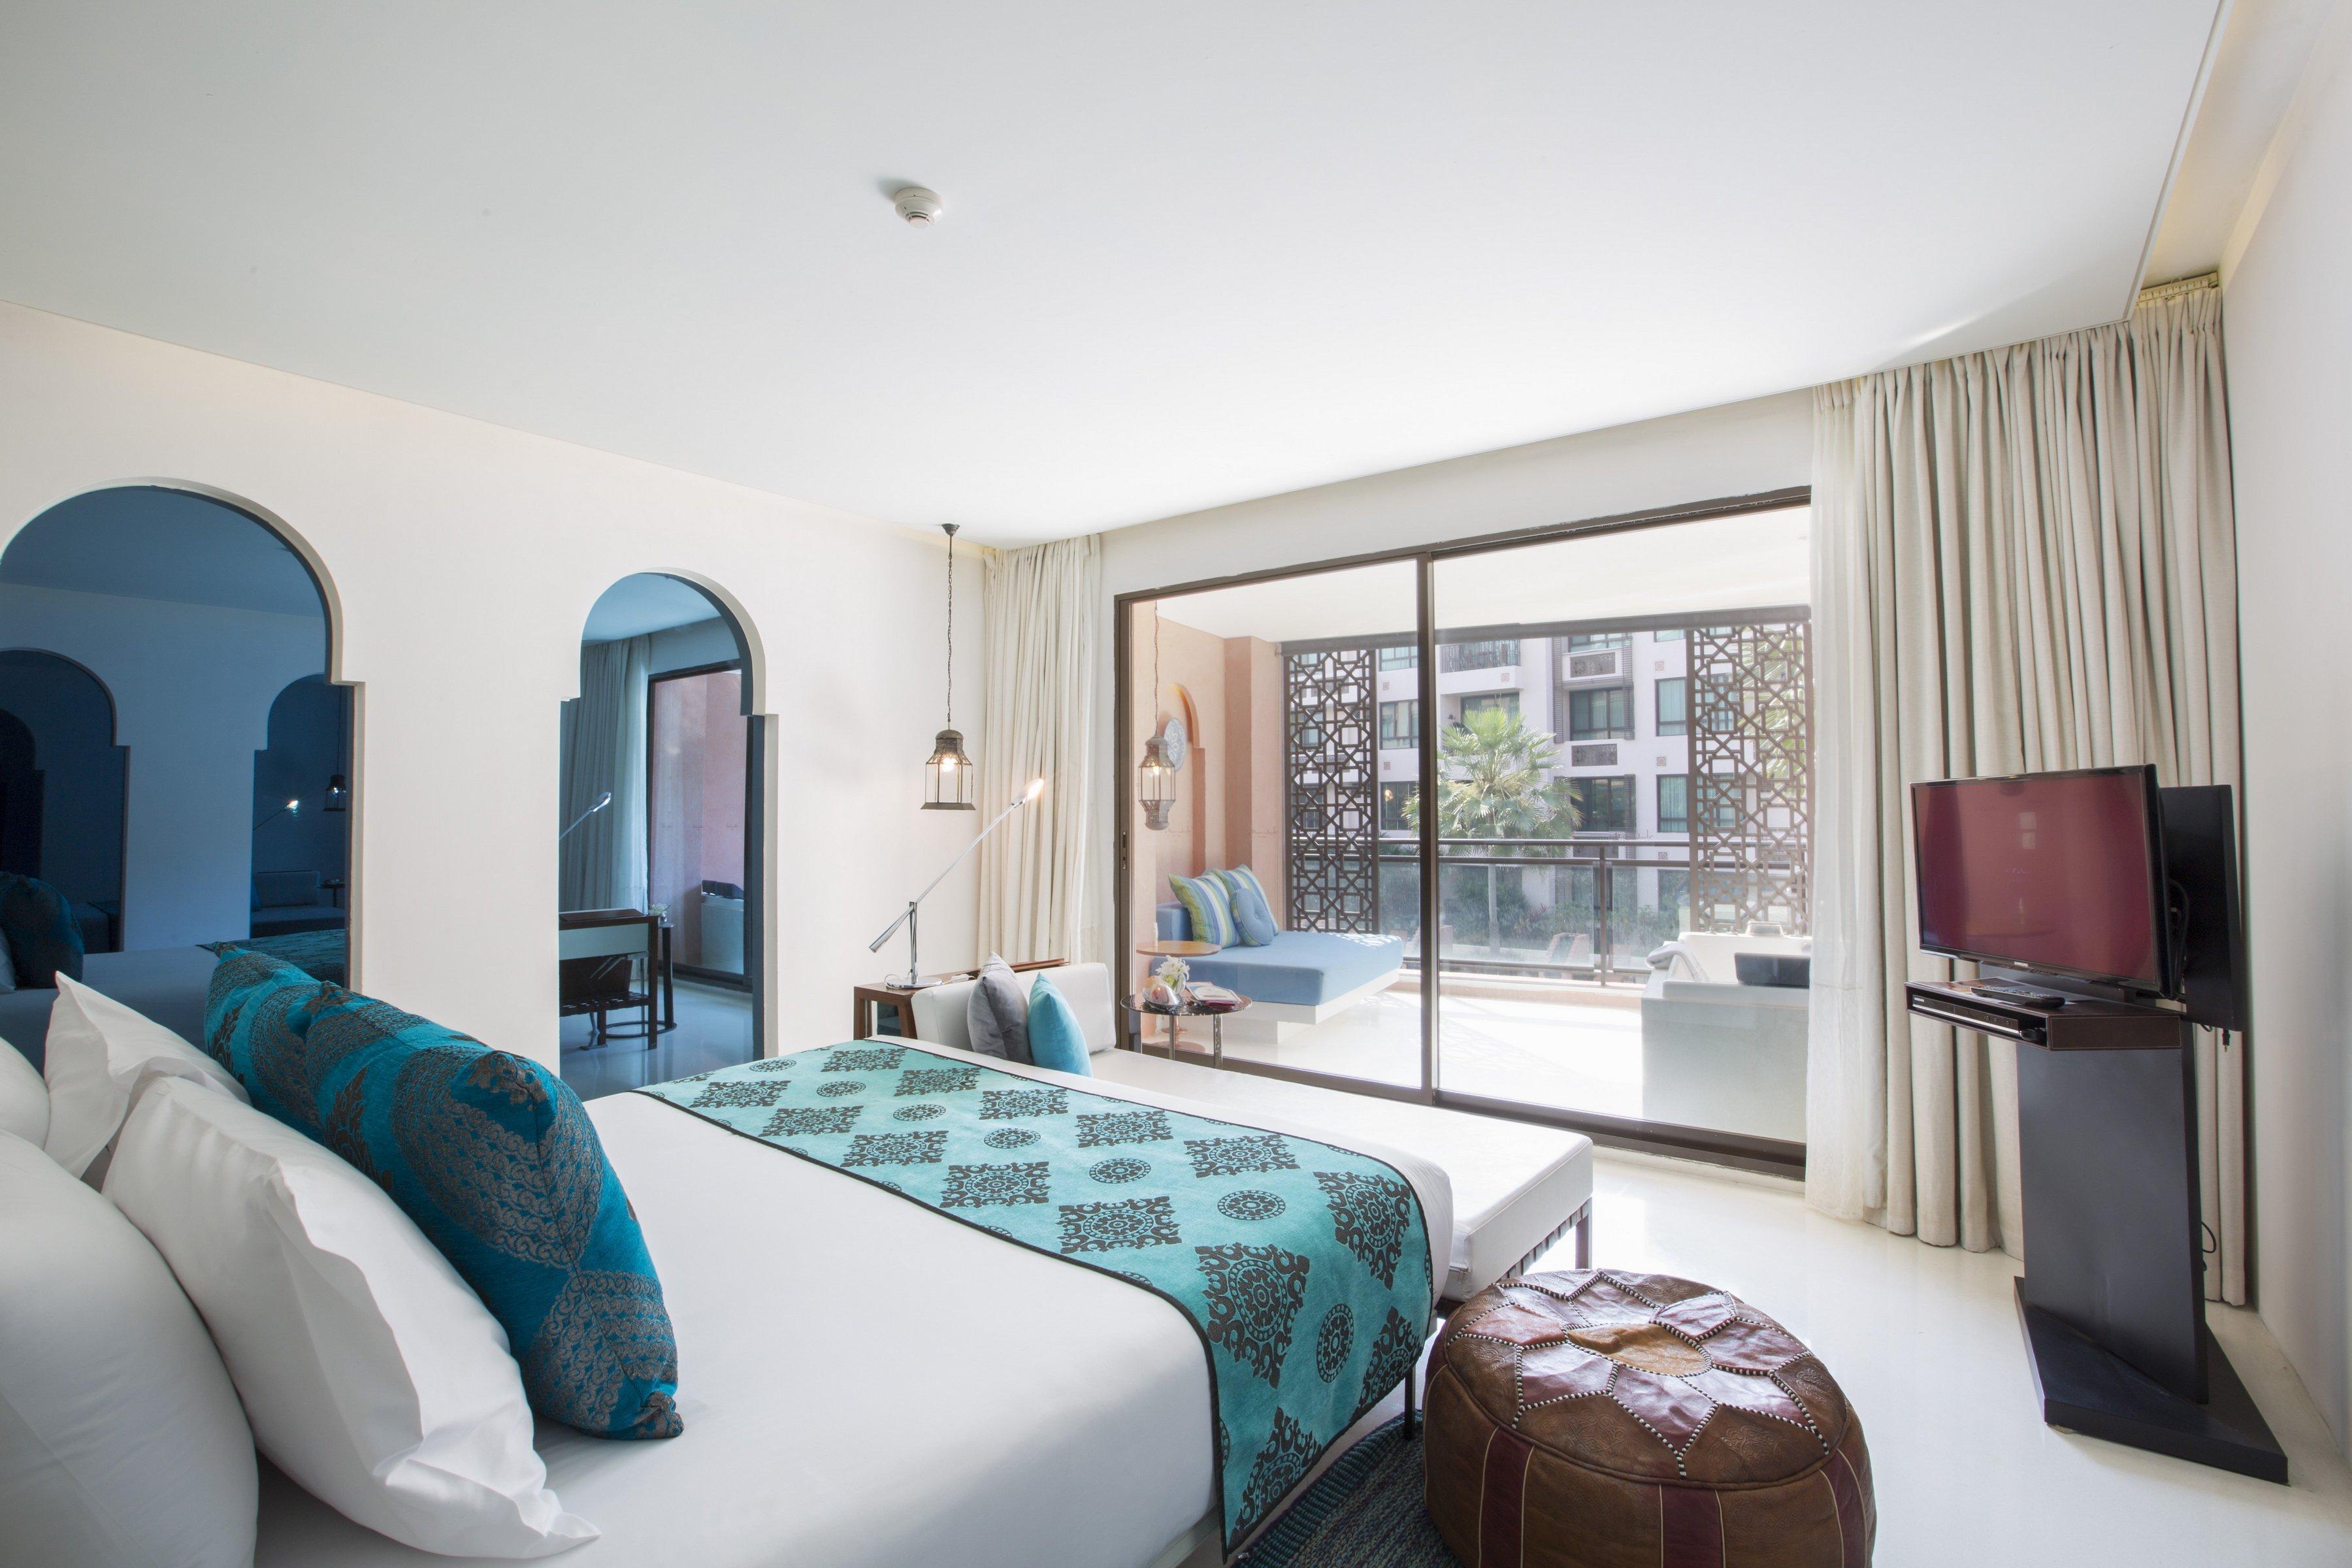 Jacuzzi-Suite-Pool-View-King-Bed-Blue-(11).jpg